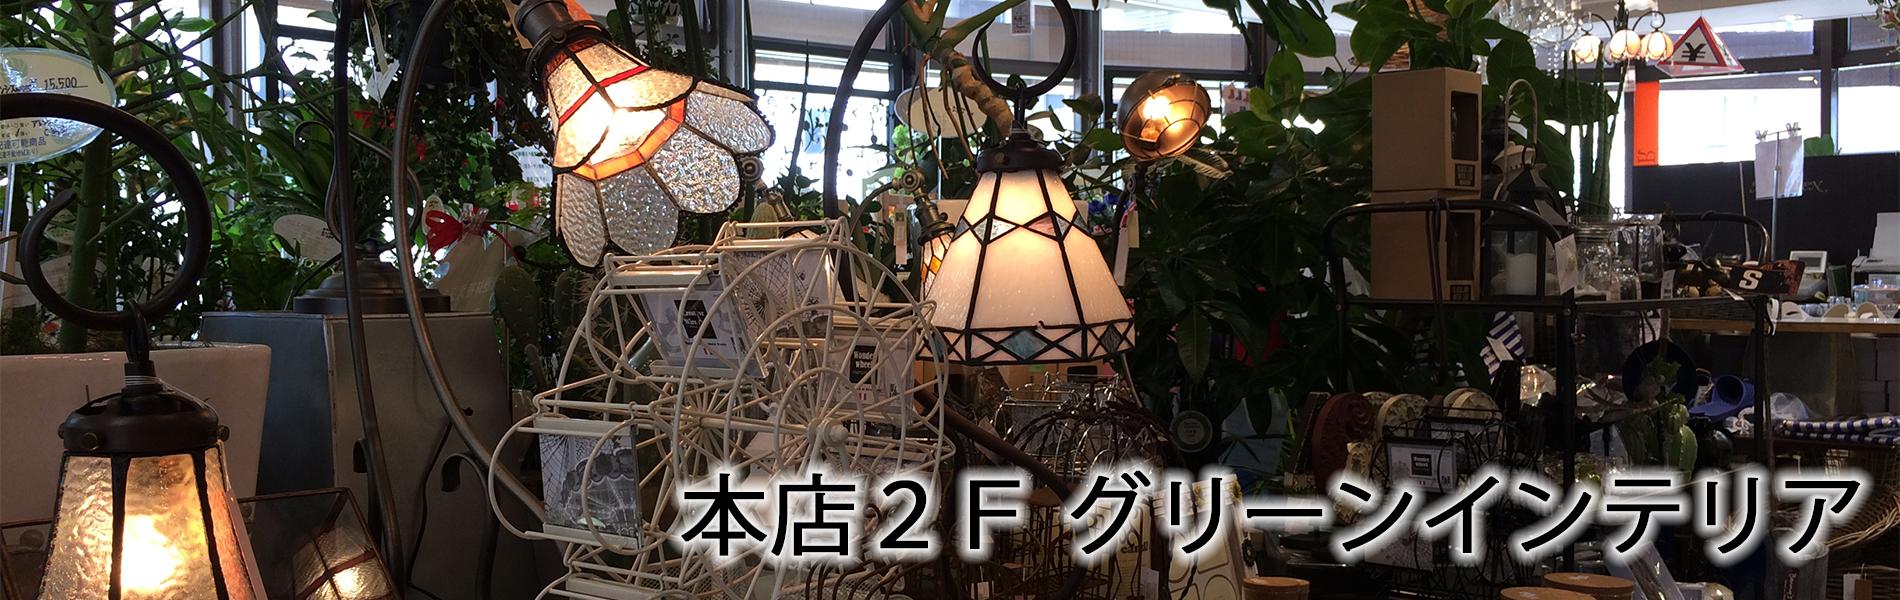 二楽園 本店2F